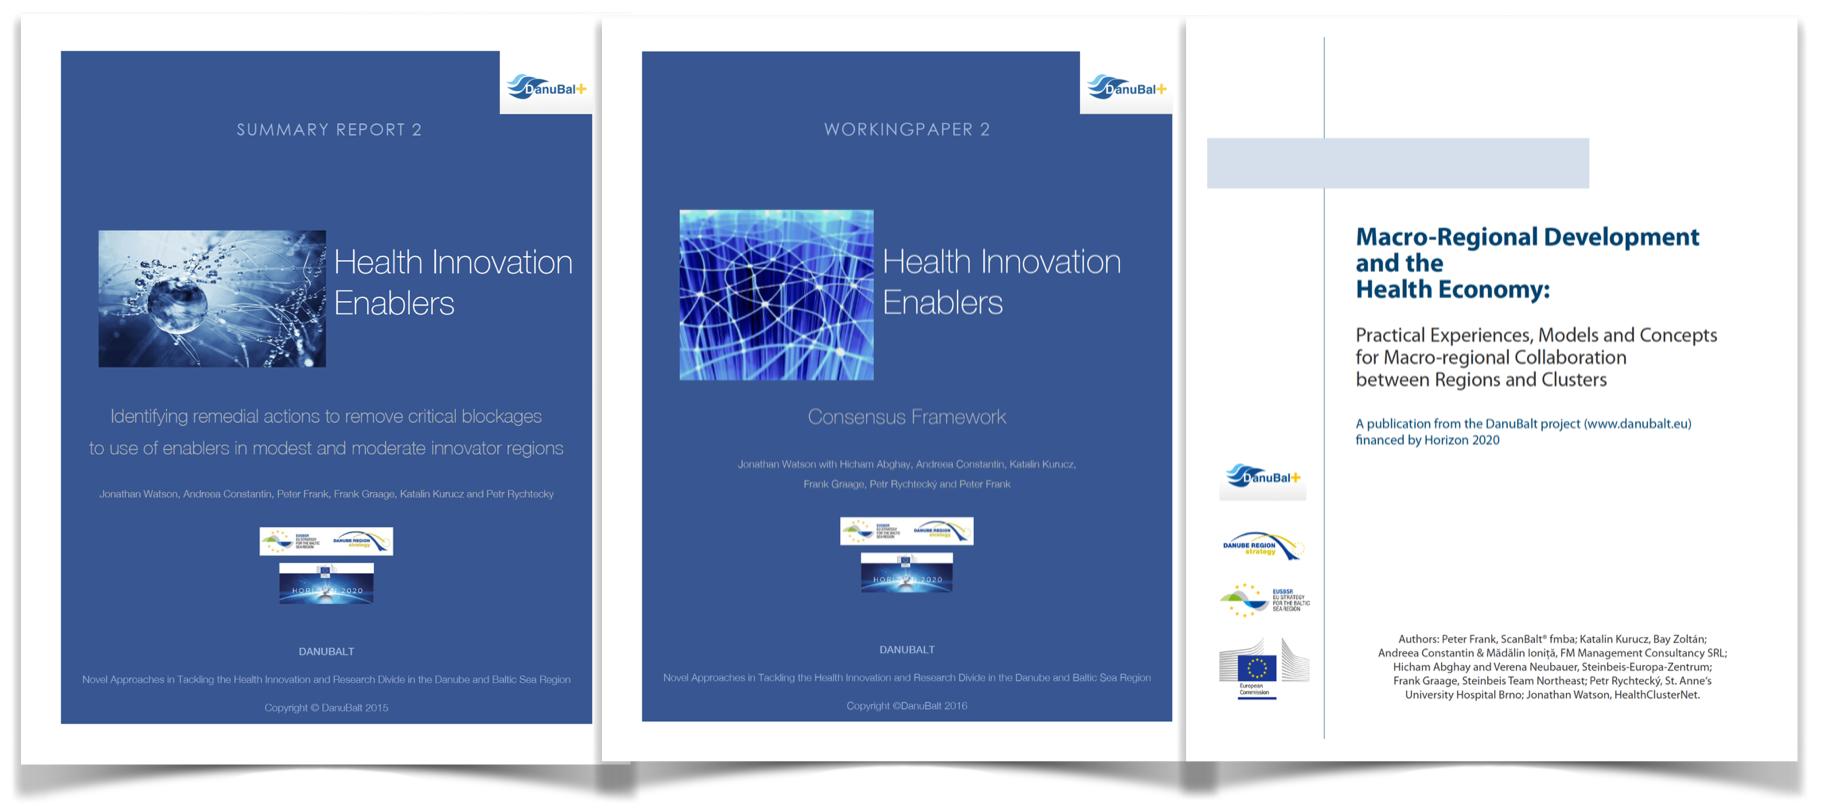 DanuBalt Publications